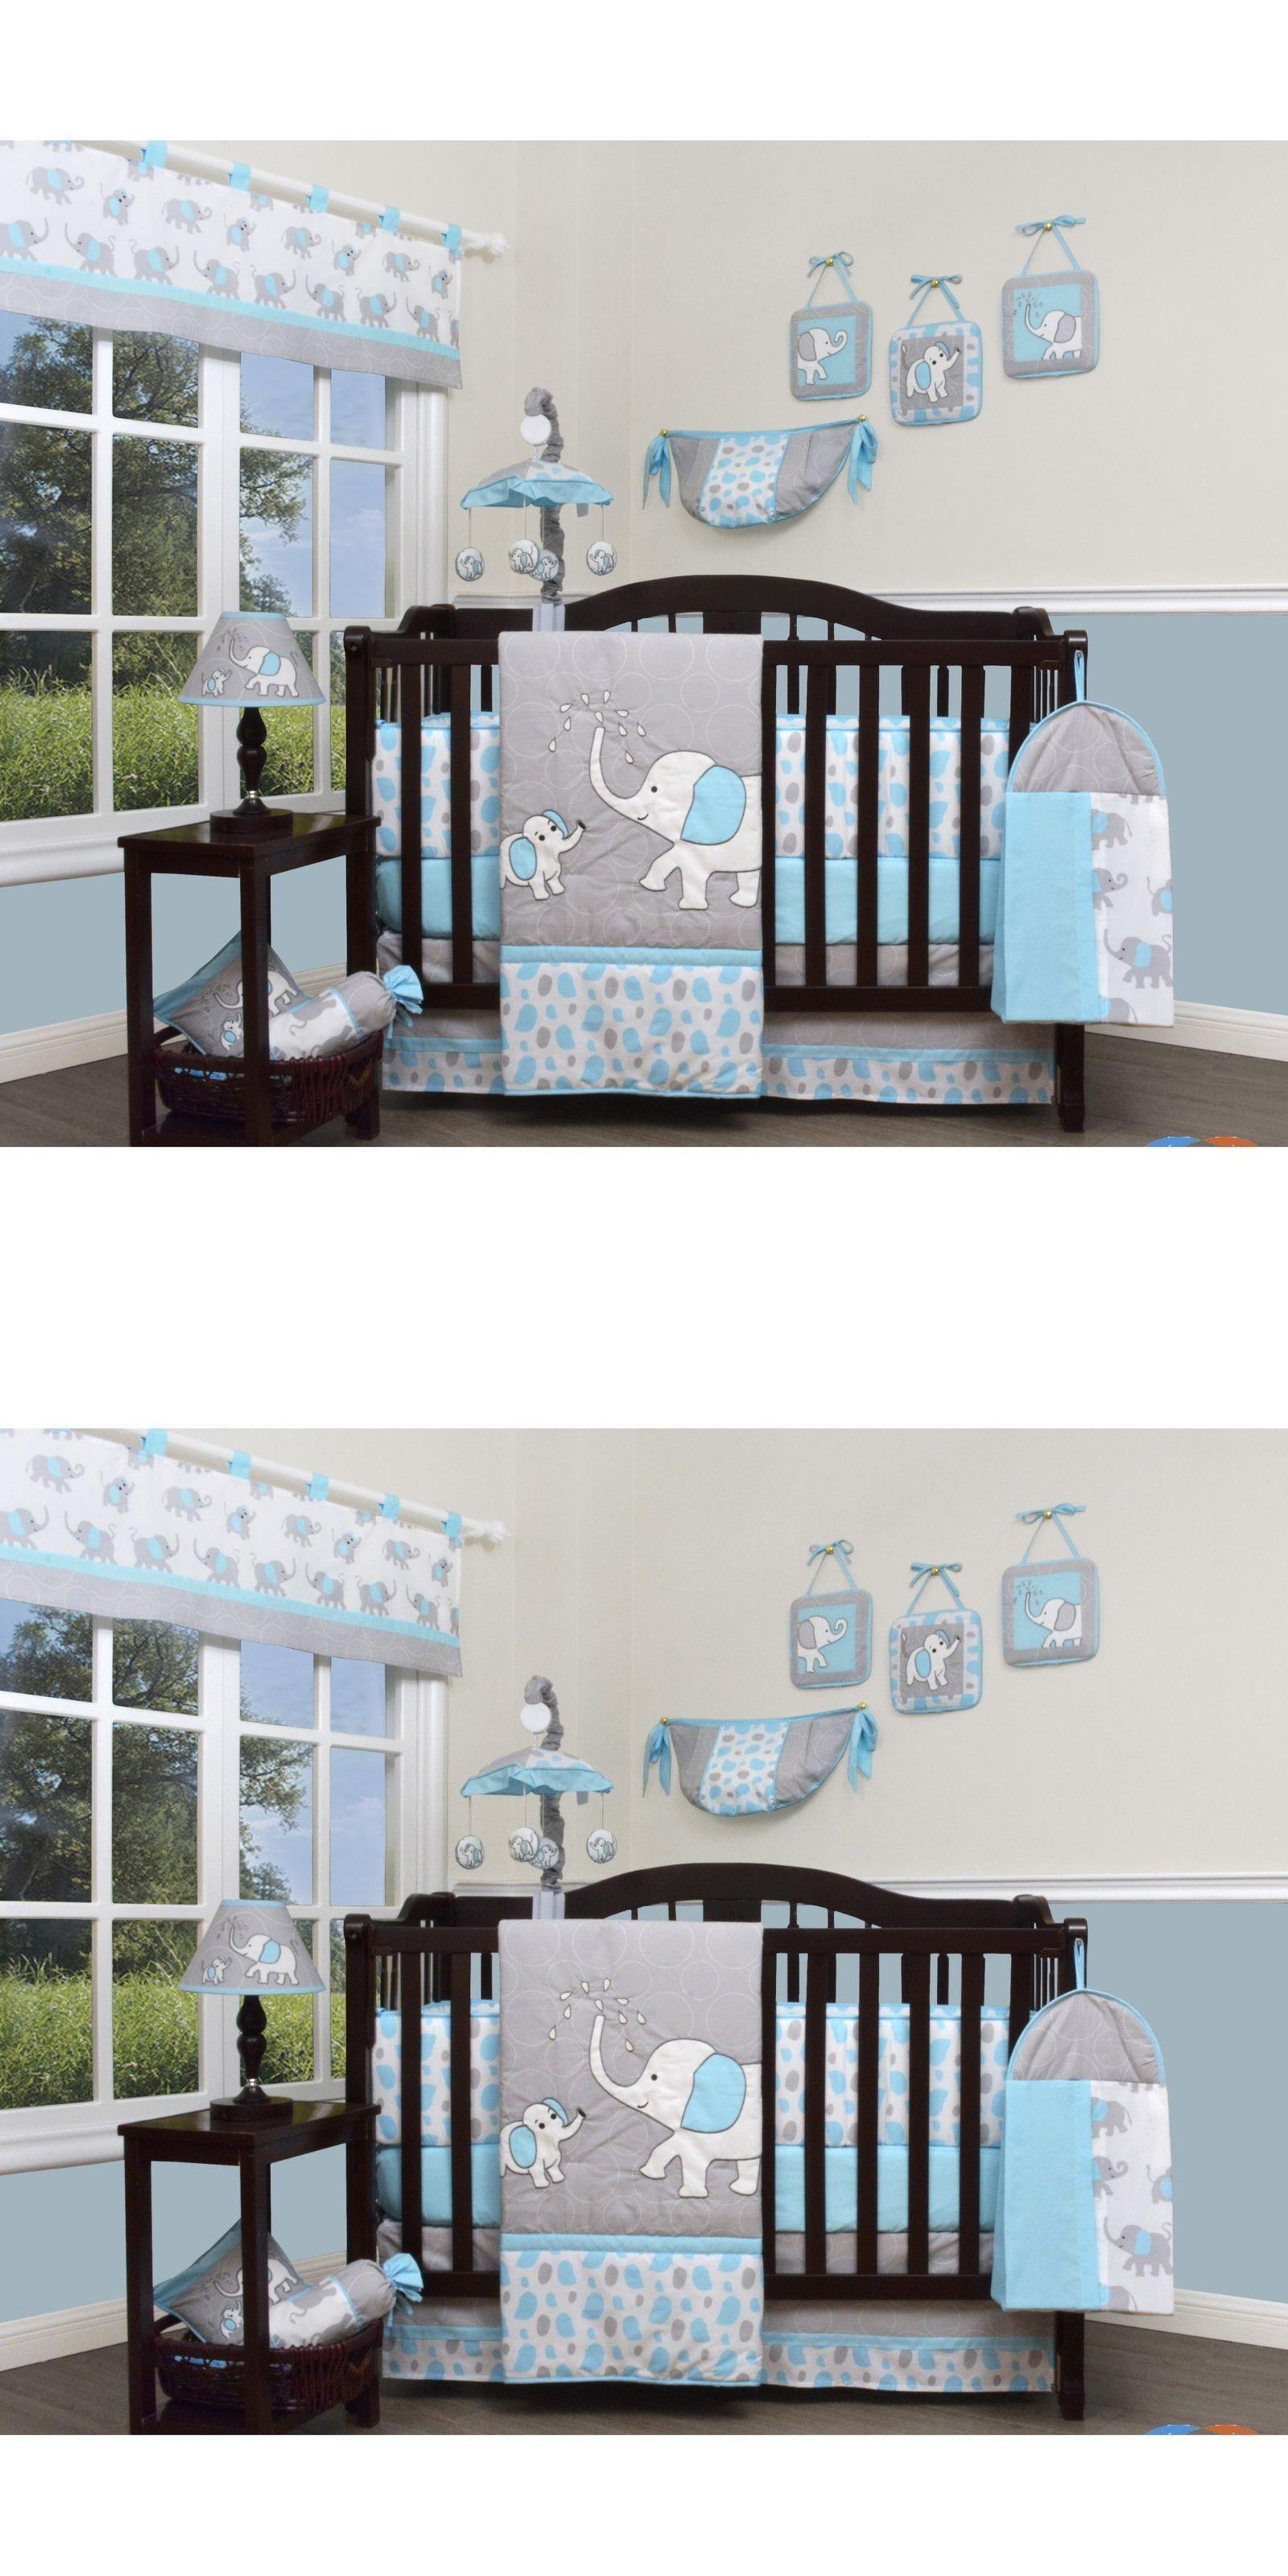 Nursery Bedding Sets 162040 Blue Gray Elephant 13 Pcs Crib Set Baby Boy Quilt Per Diaper It Now Only 138 On Ebay